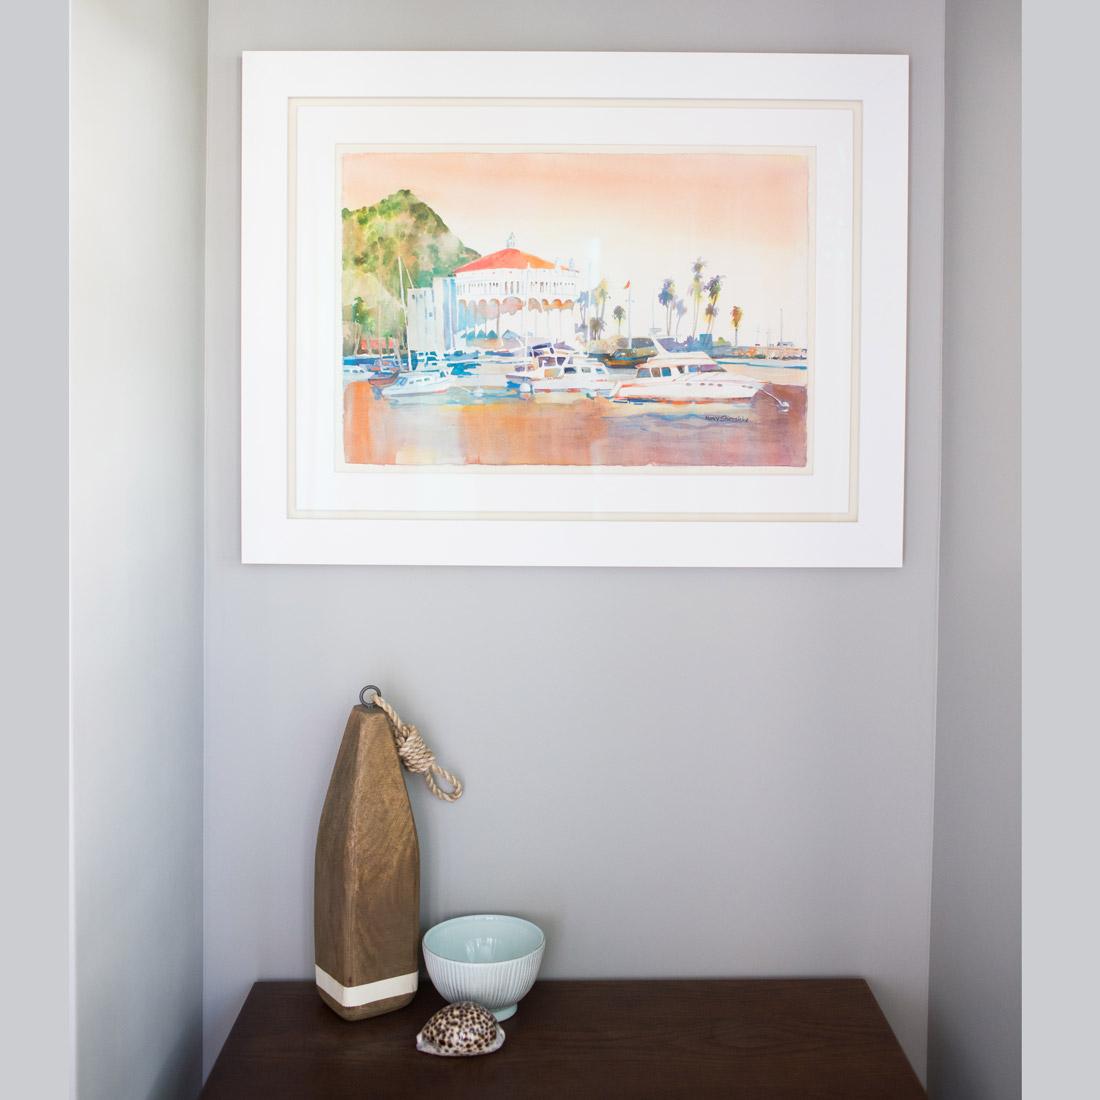 seaside beachy entryway with watercolor artwork of catalina island and table top decor design by sara bates interior design